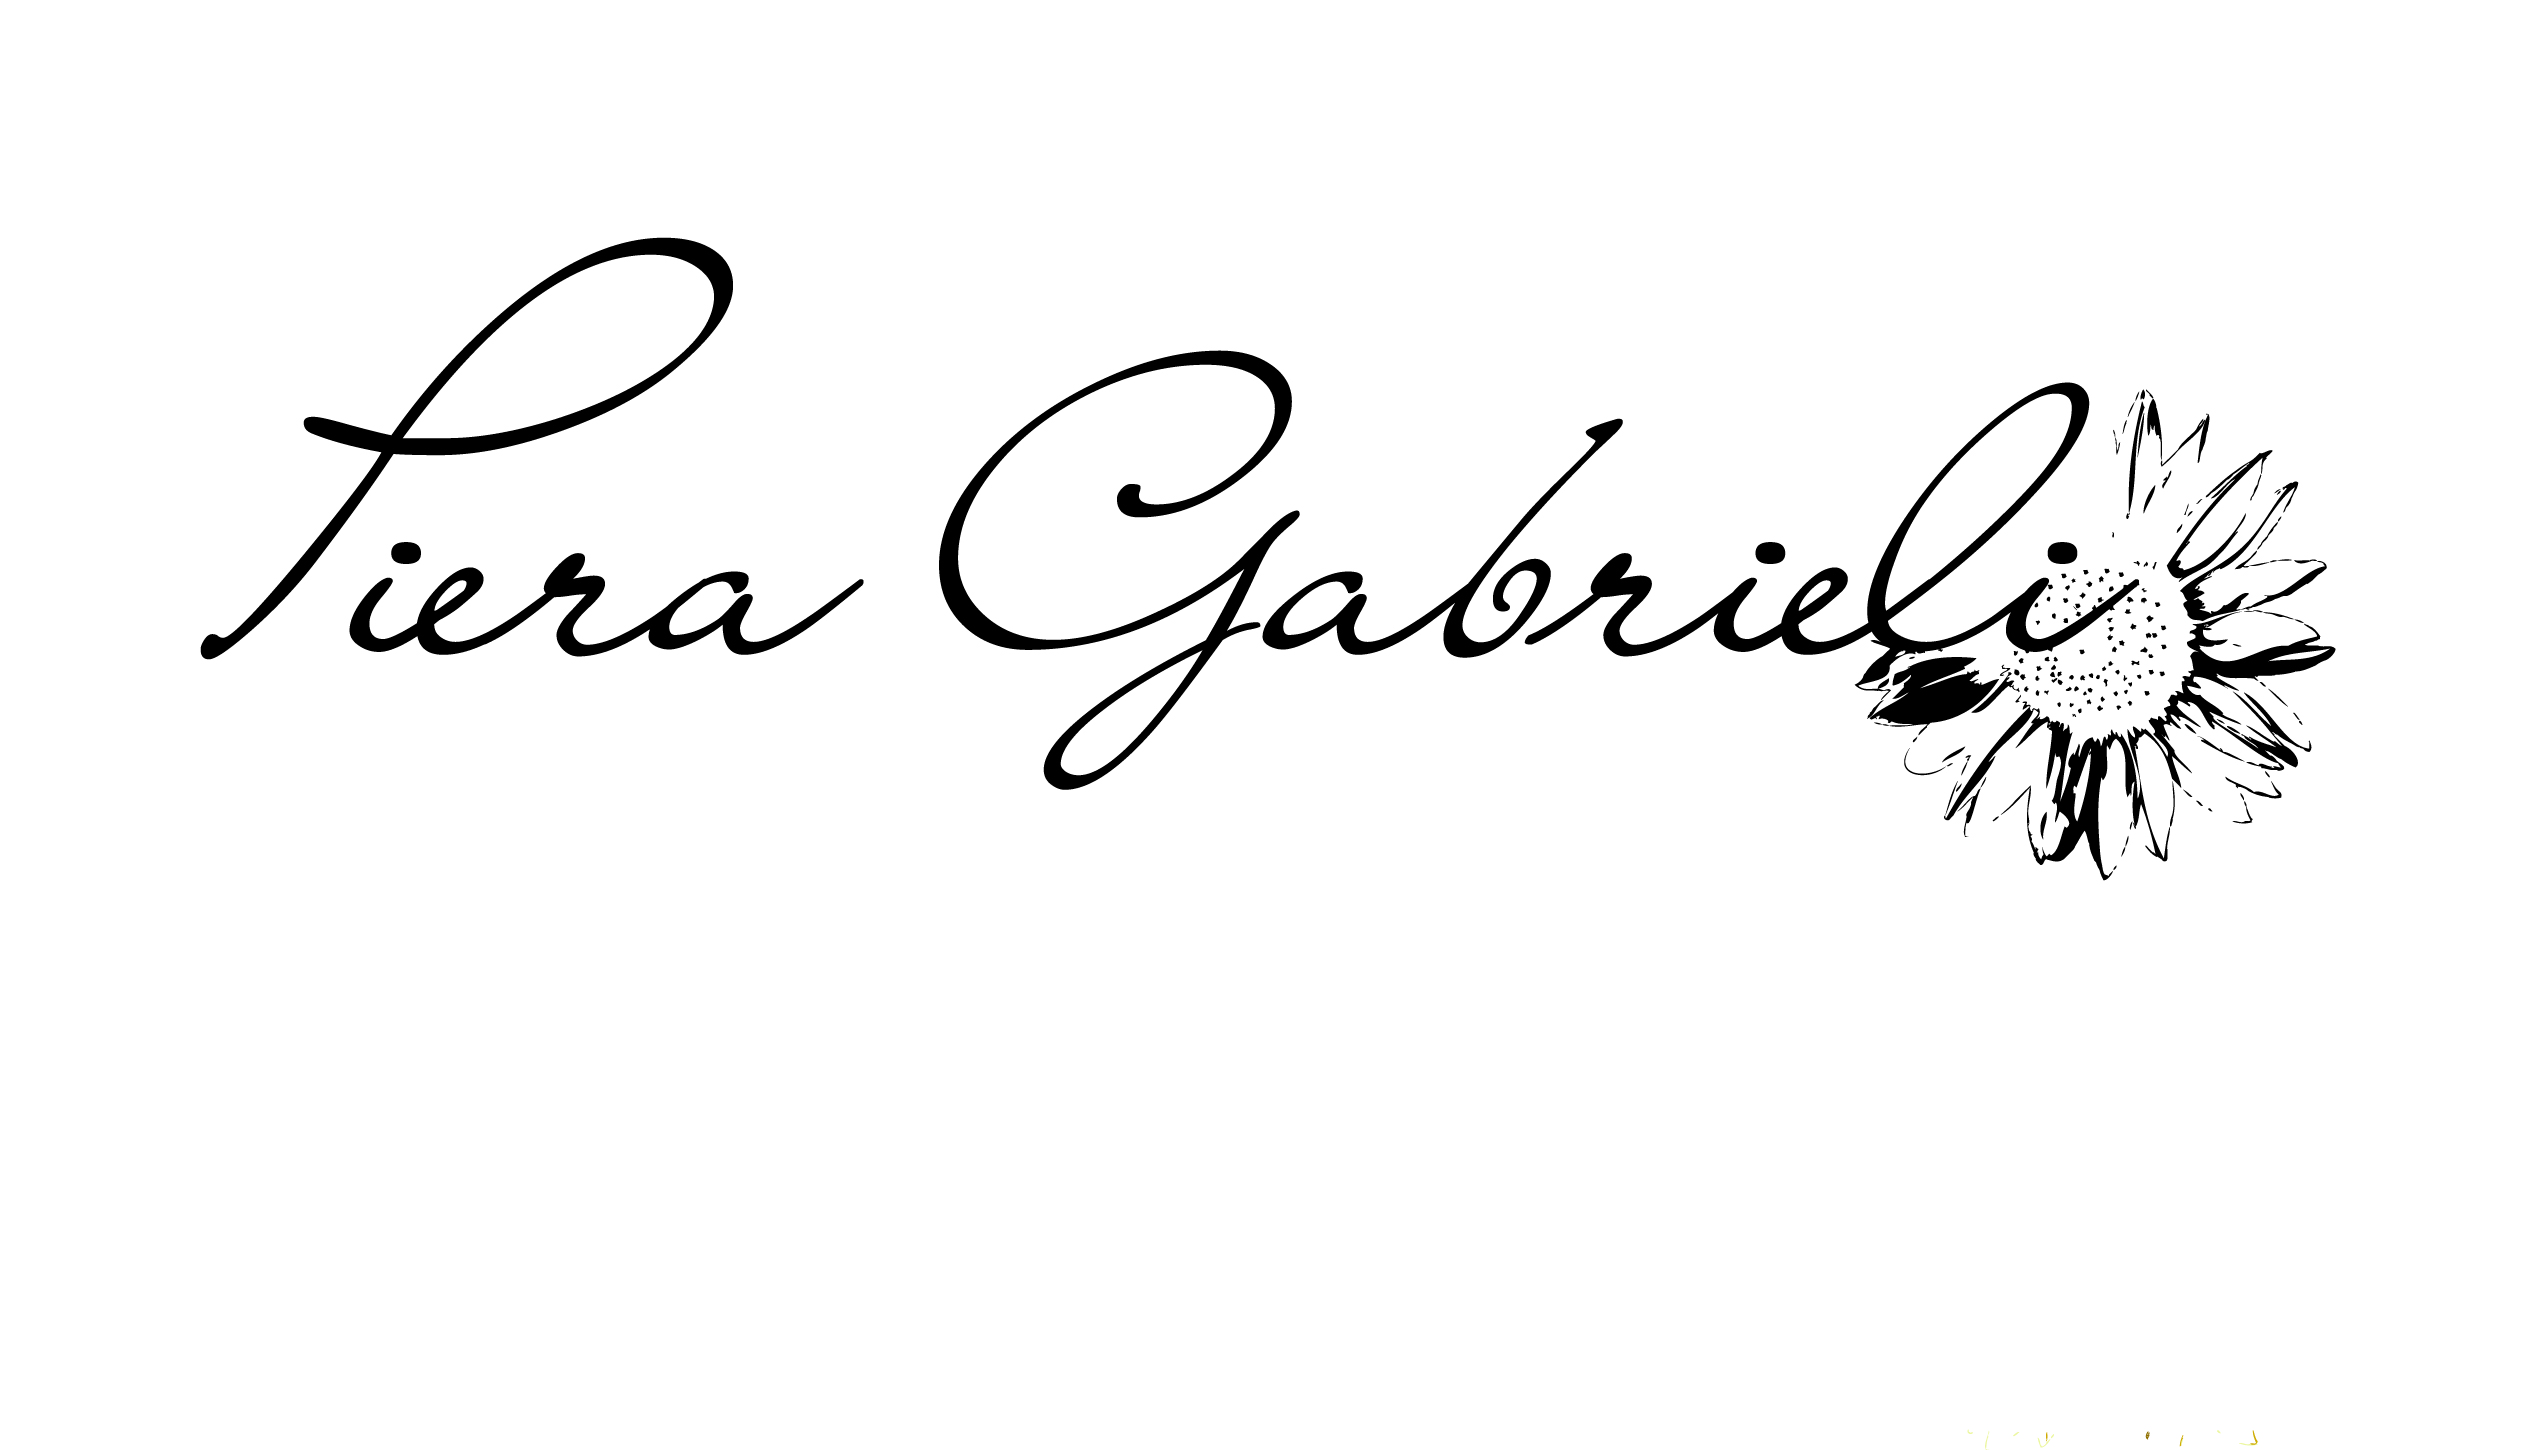 PIERA GABRIELI LOGO